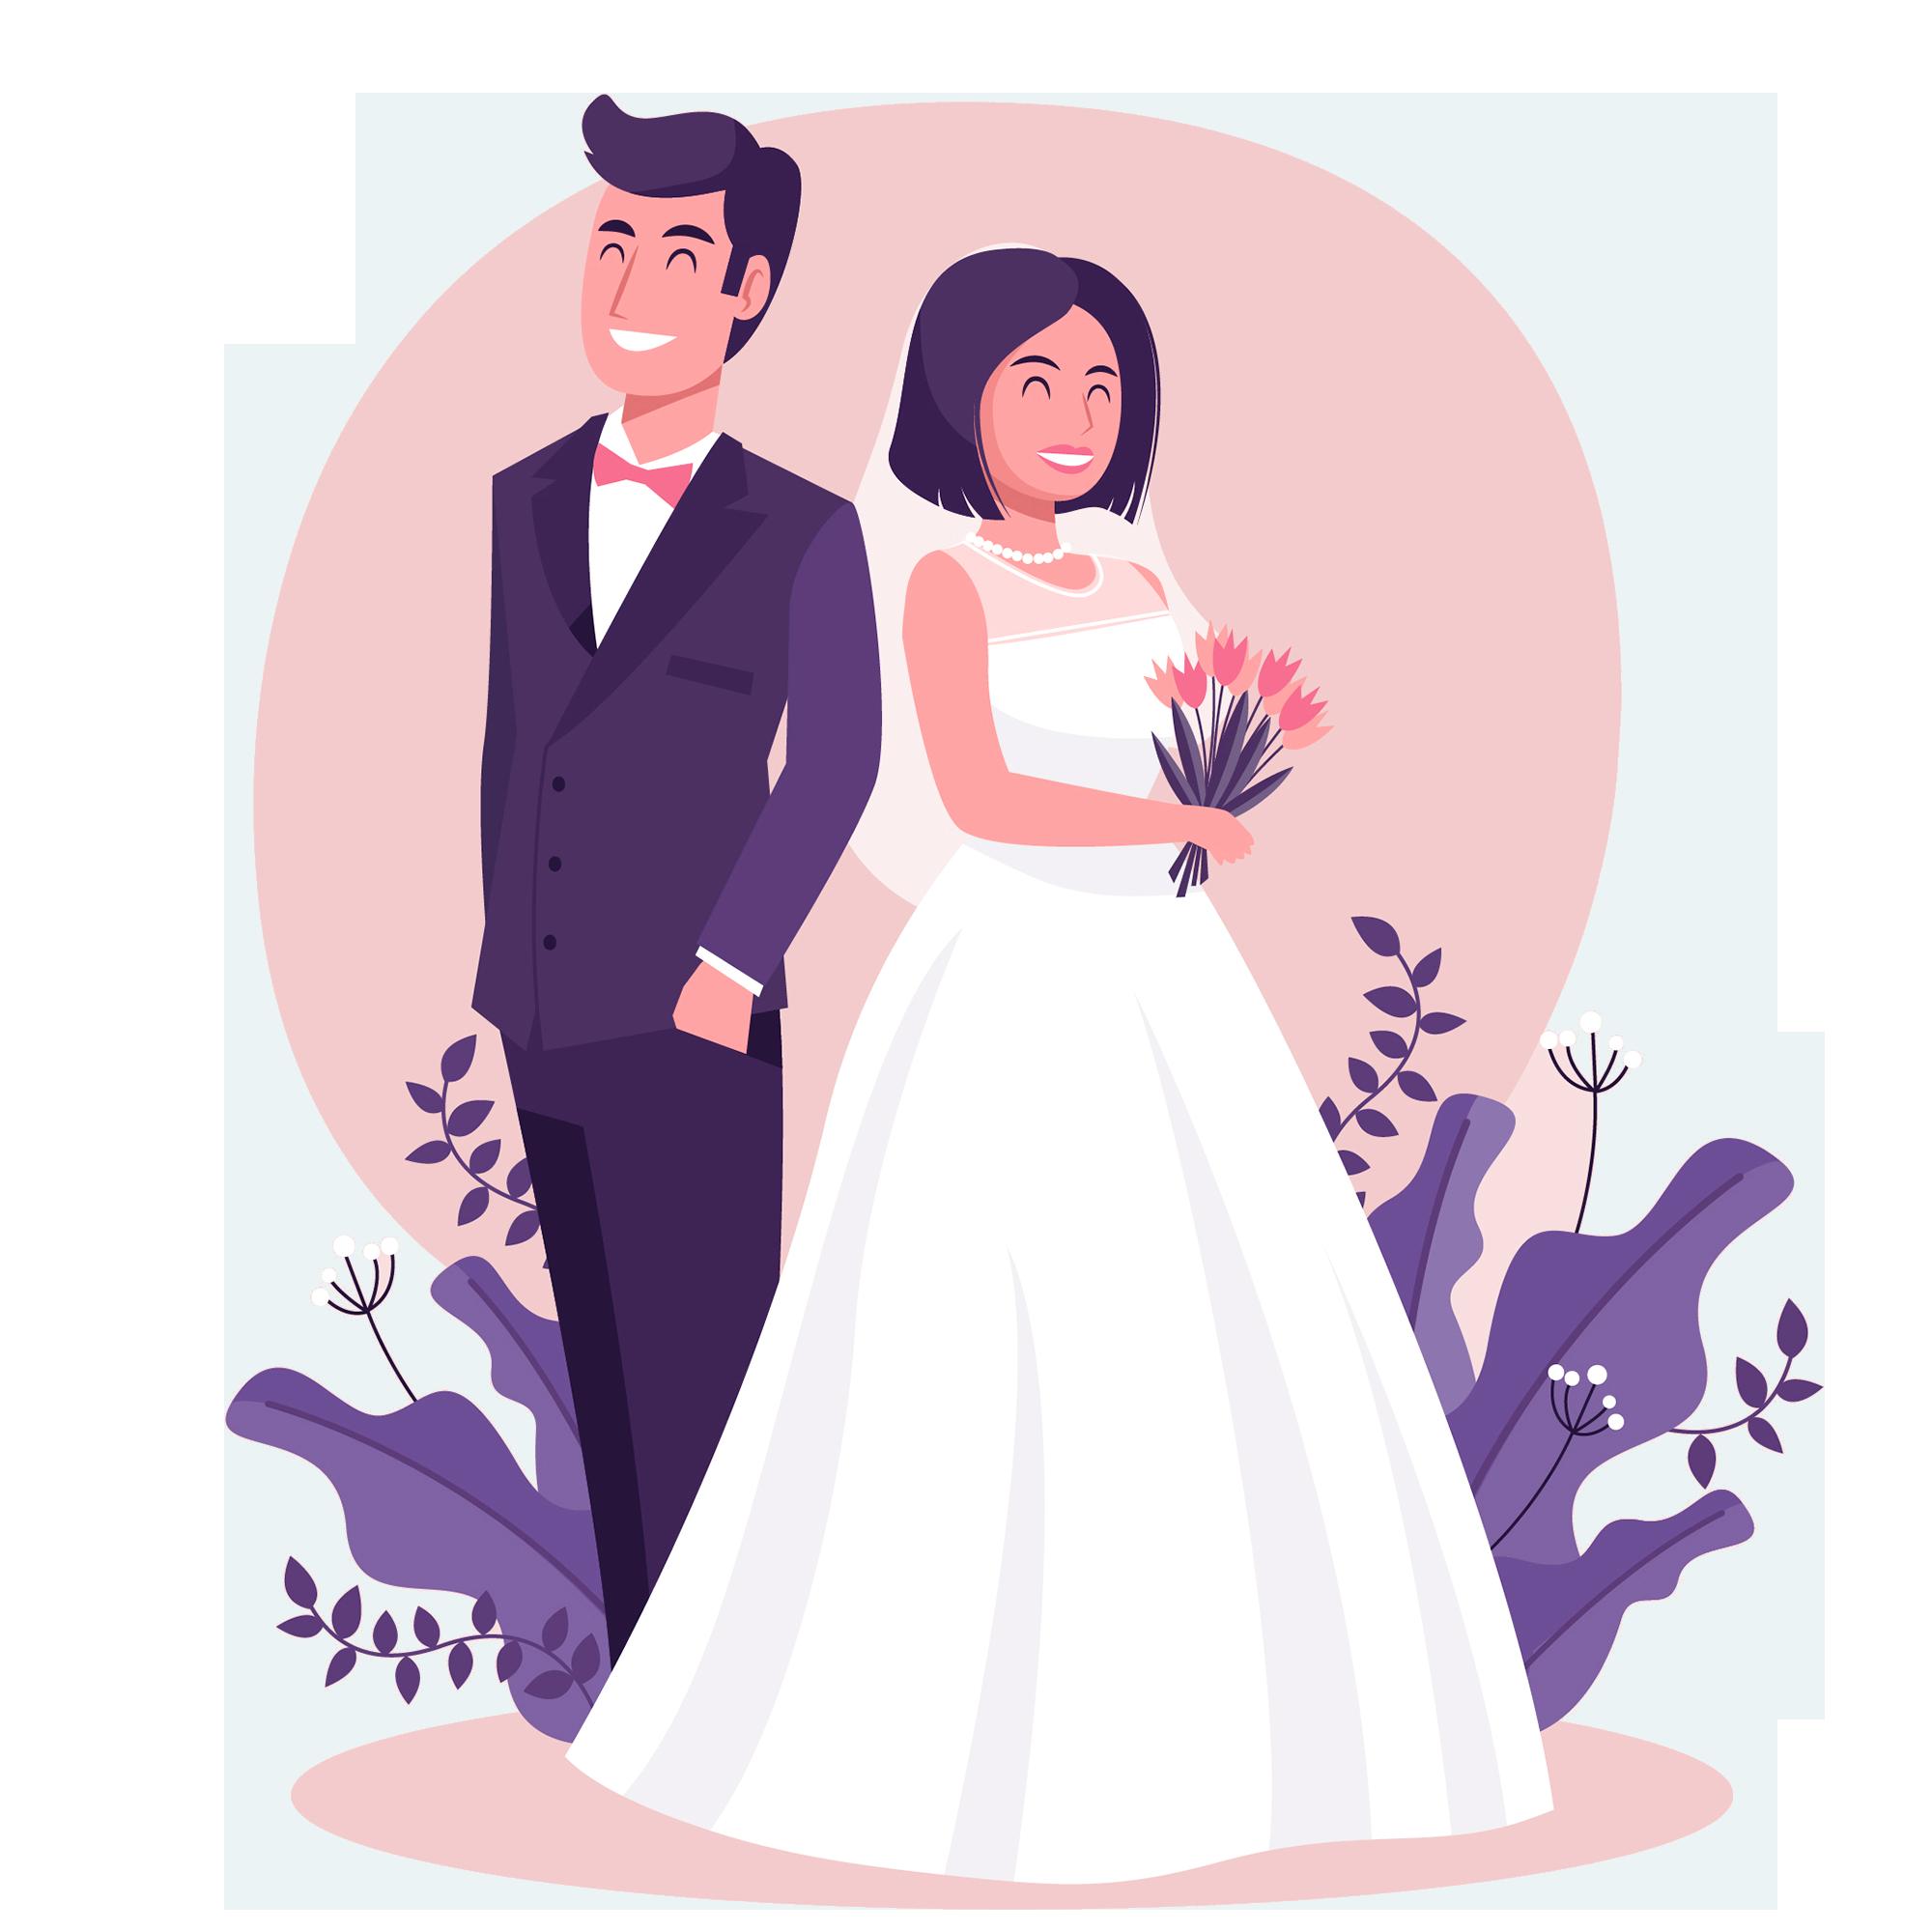 matrimonio, stress da matrimonio